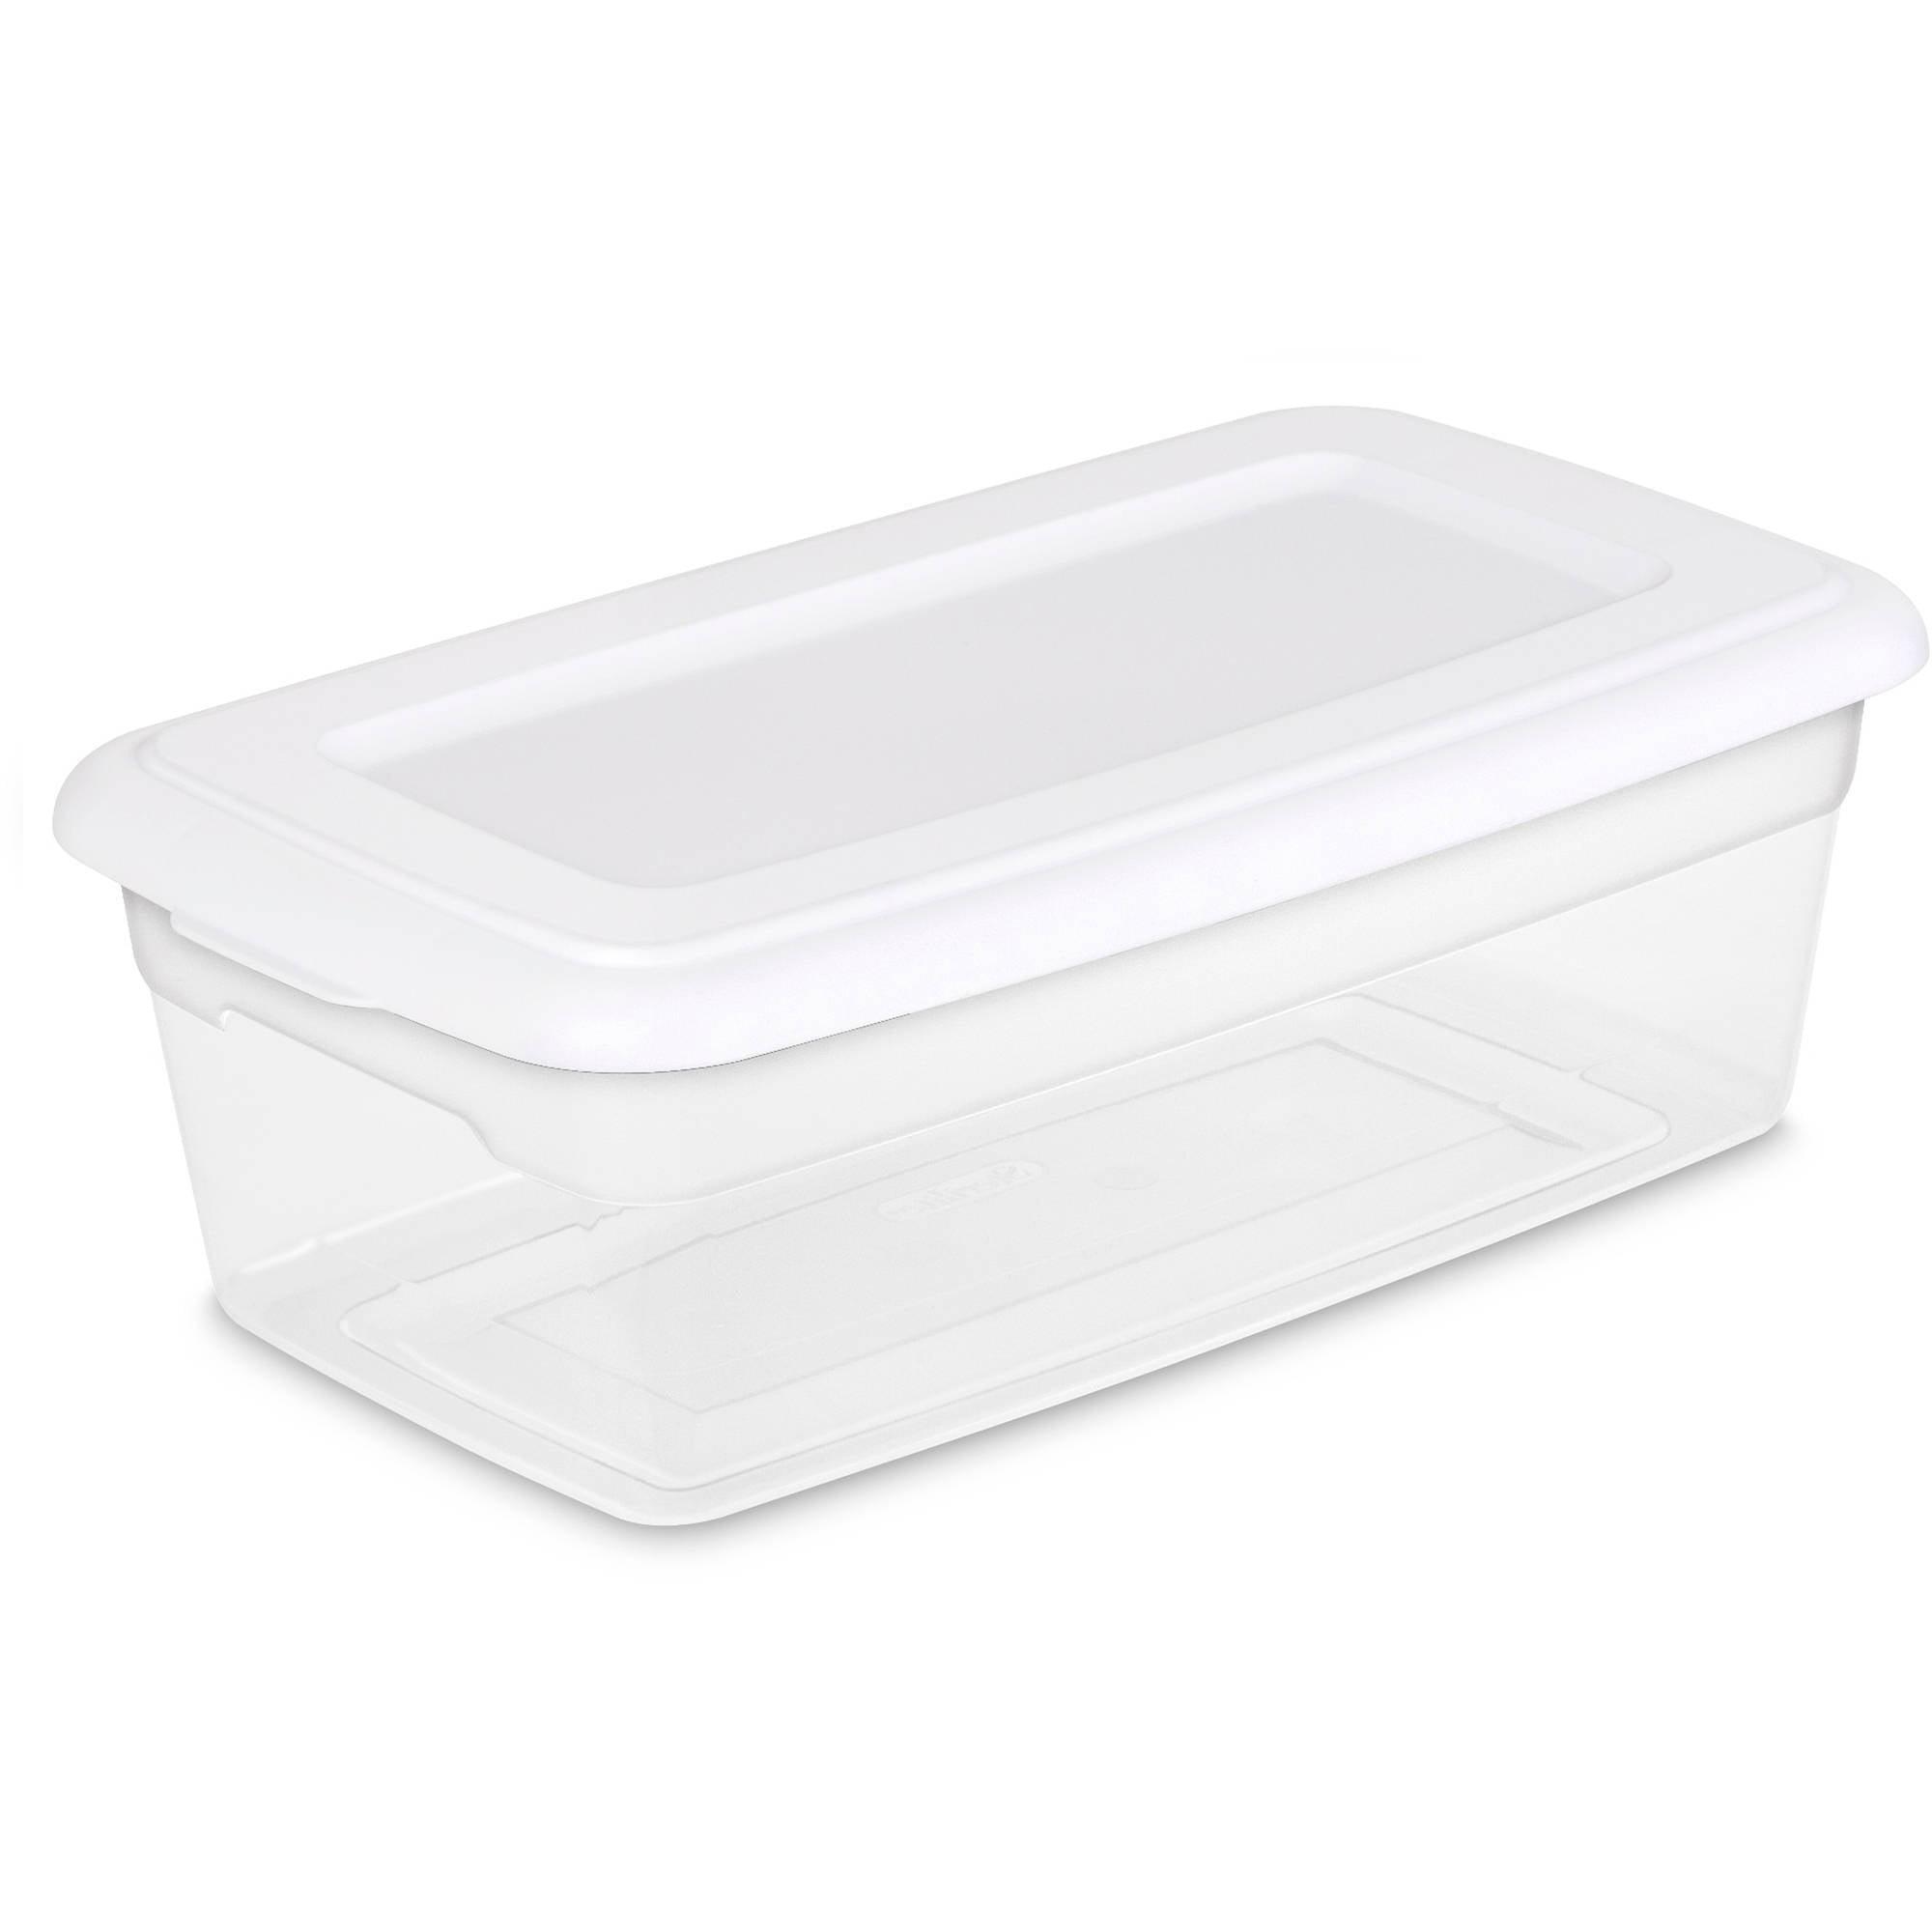 Sterilite 6 Quart Storage Box- White (Available in Case of 36 or Single Unit)